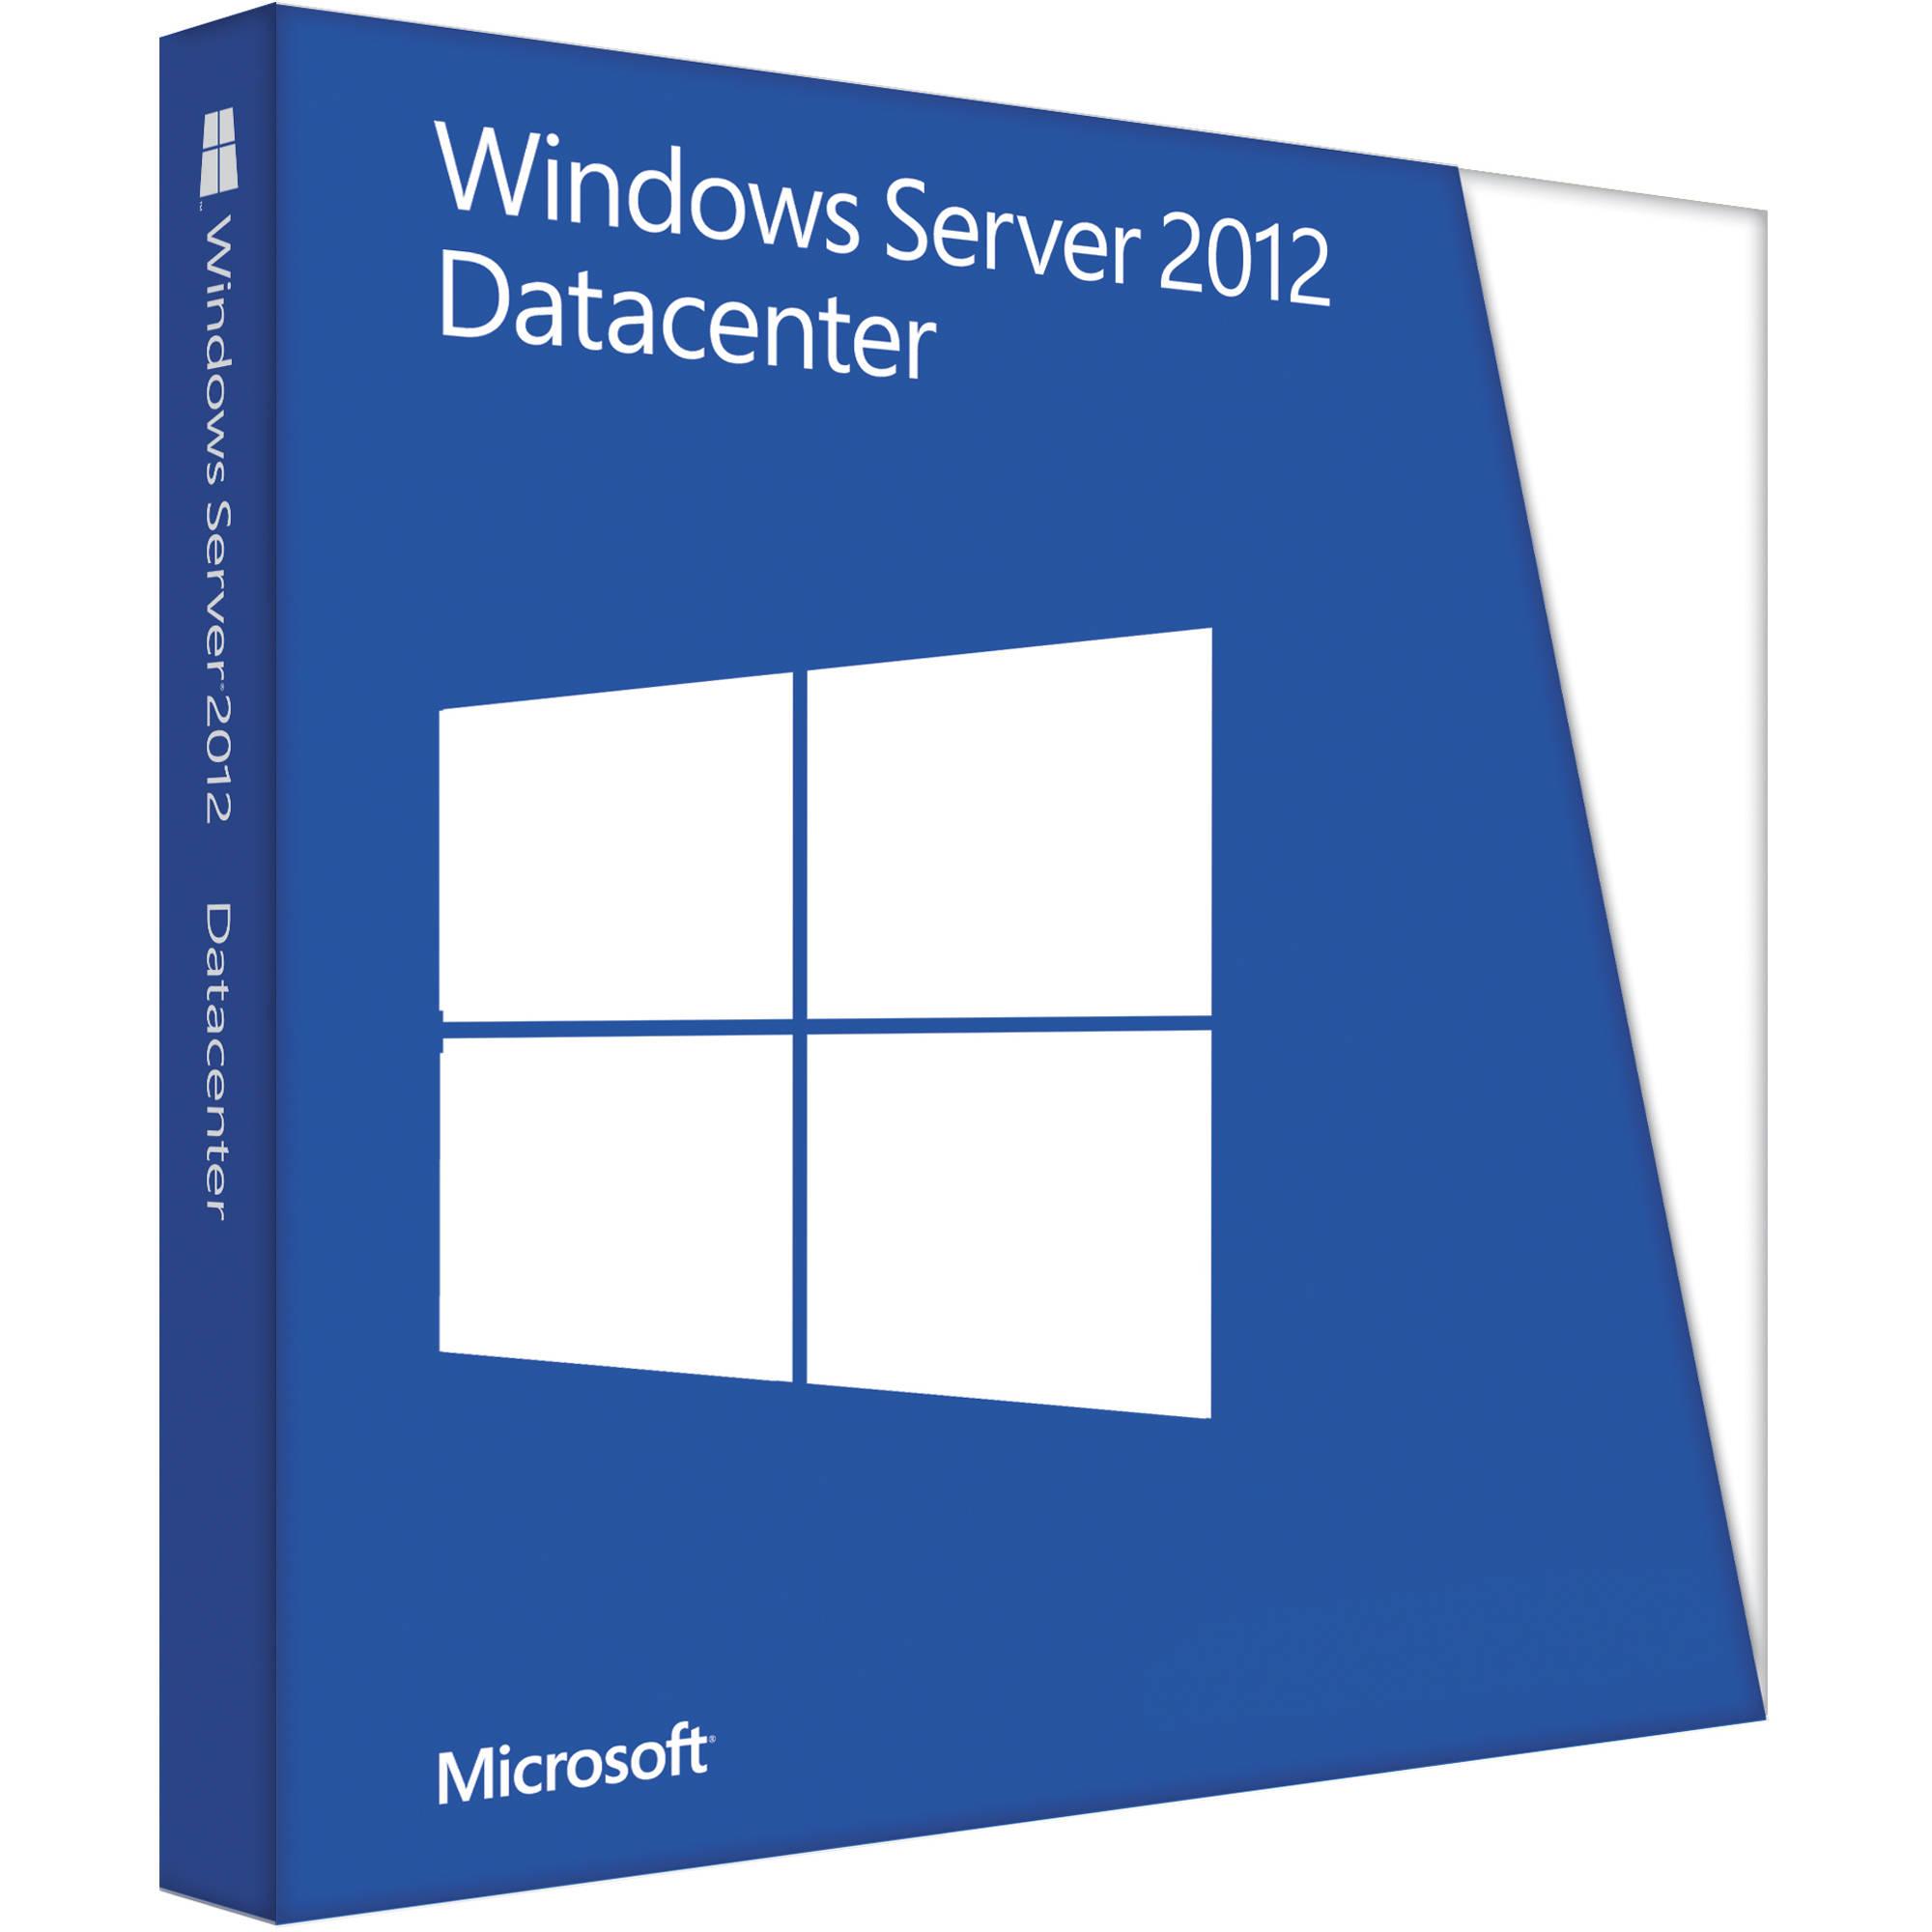 Buy Windows Server 2012 Datacenter Cheap